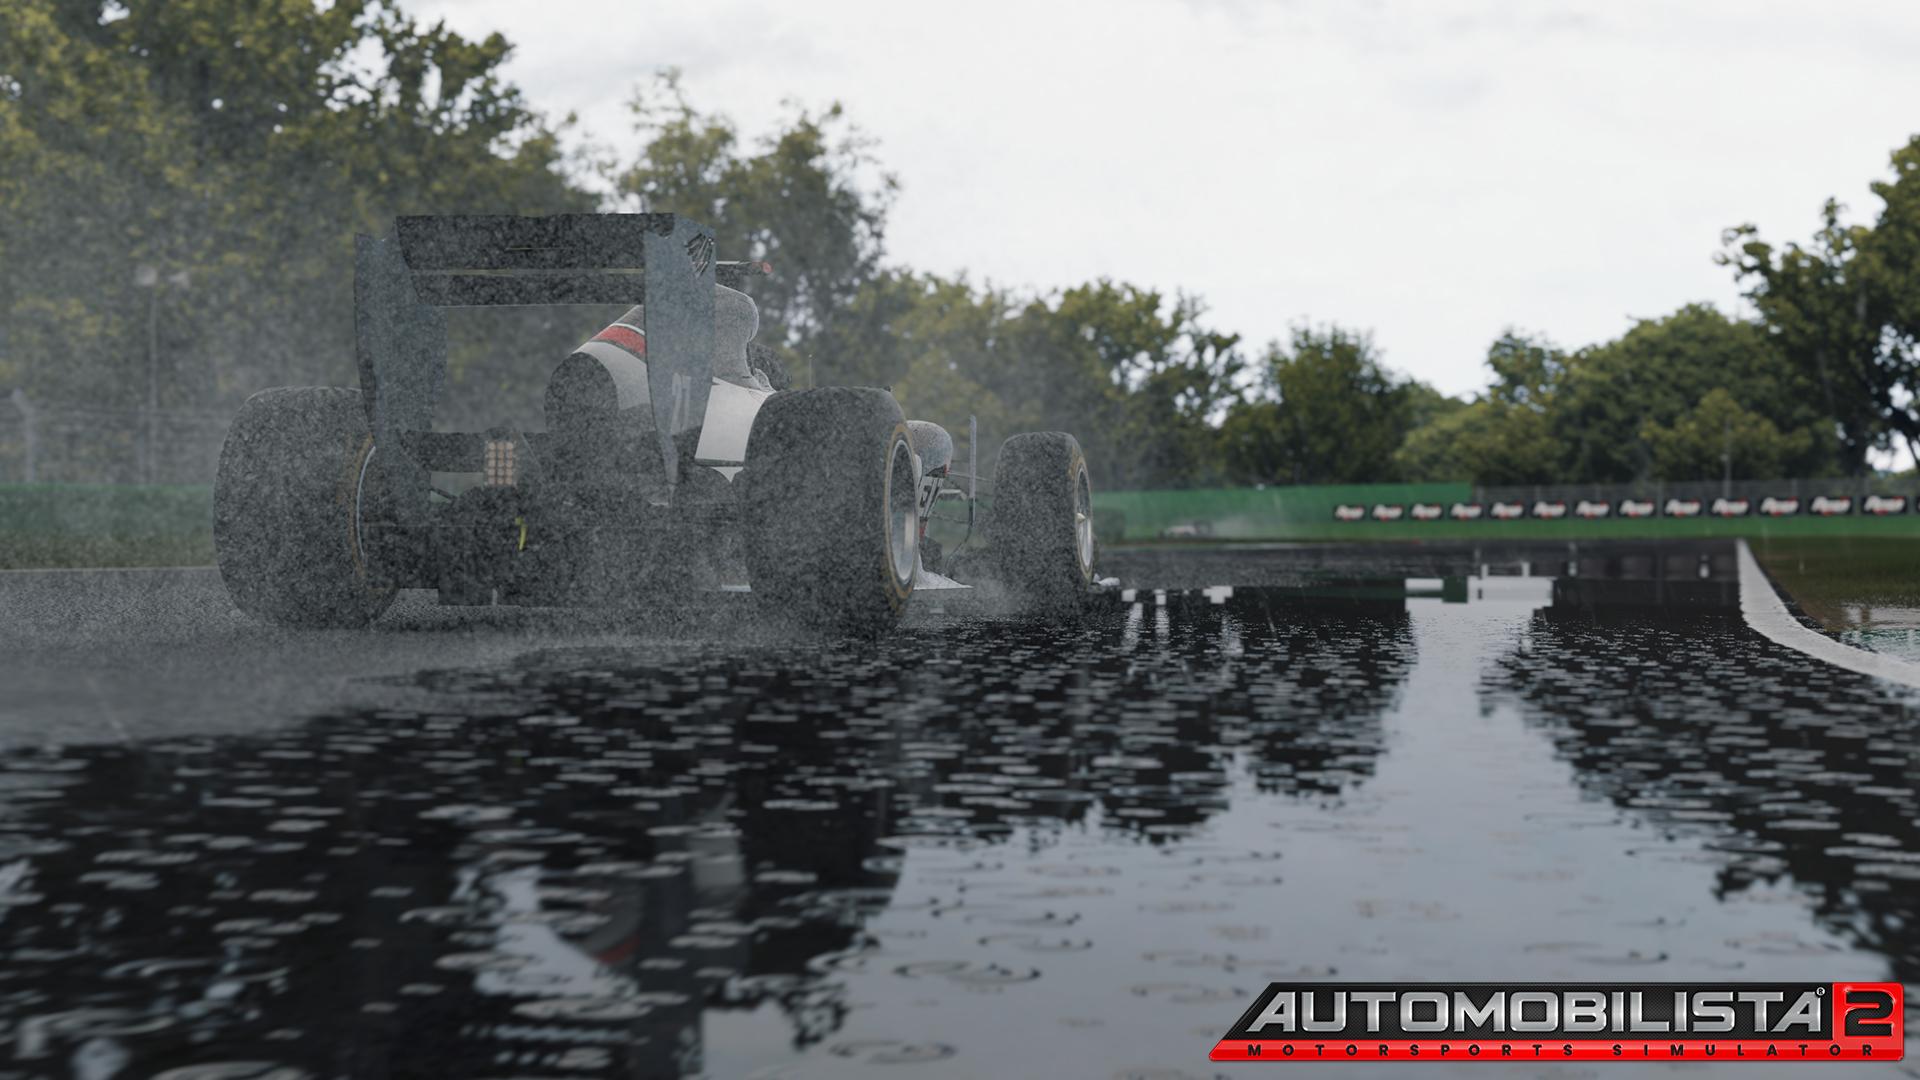 AUTOMOBILISTA 2 Ams-2-interview-6-jpg